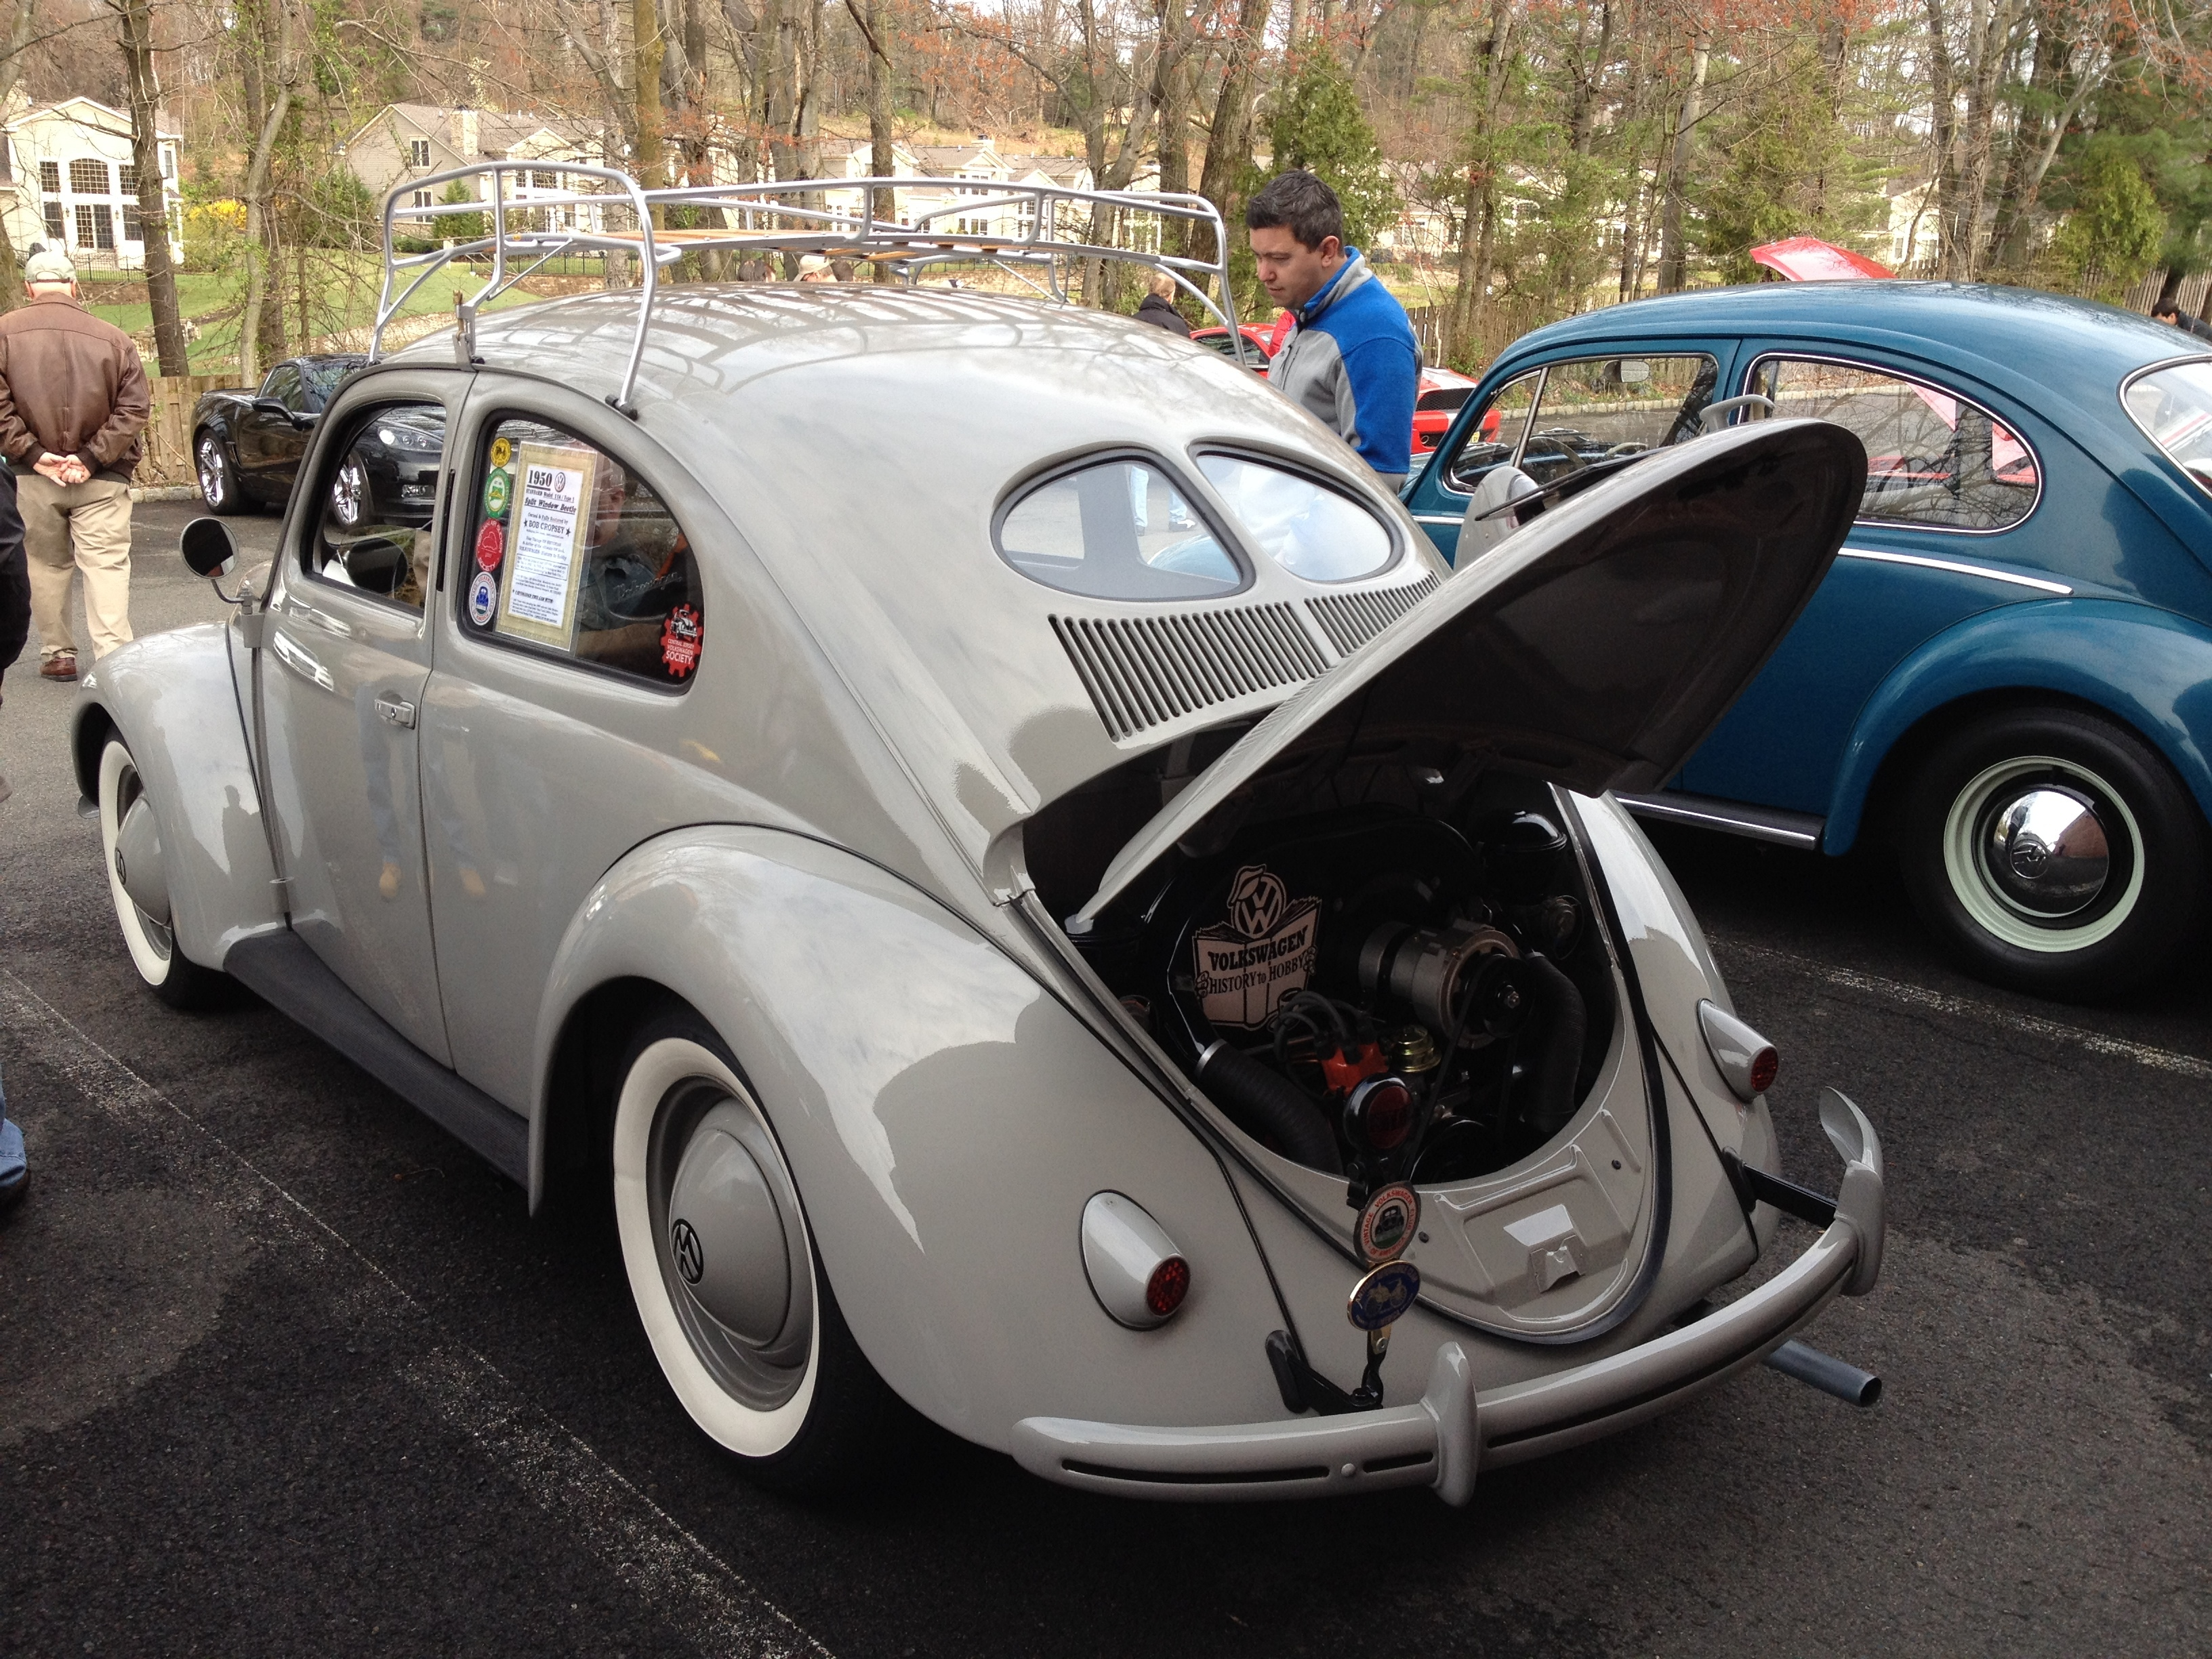 Cars and Croissants - Chatham NJ-04-01-2012-807.jpg